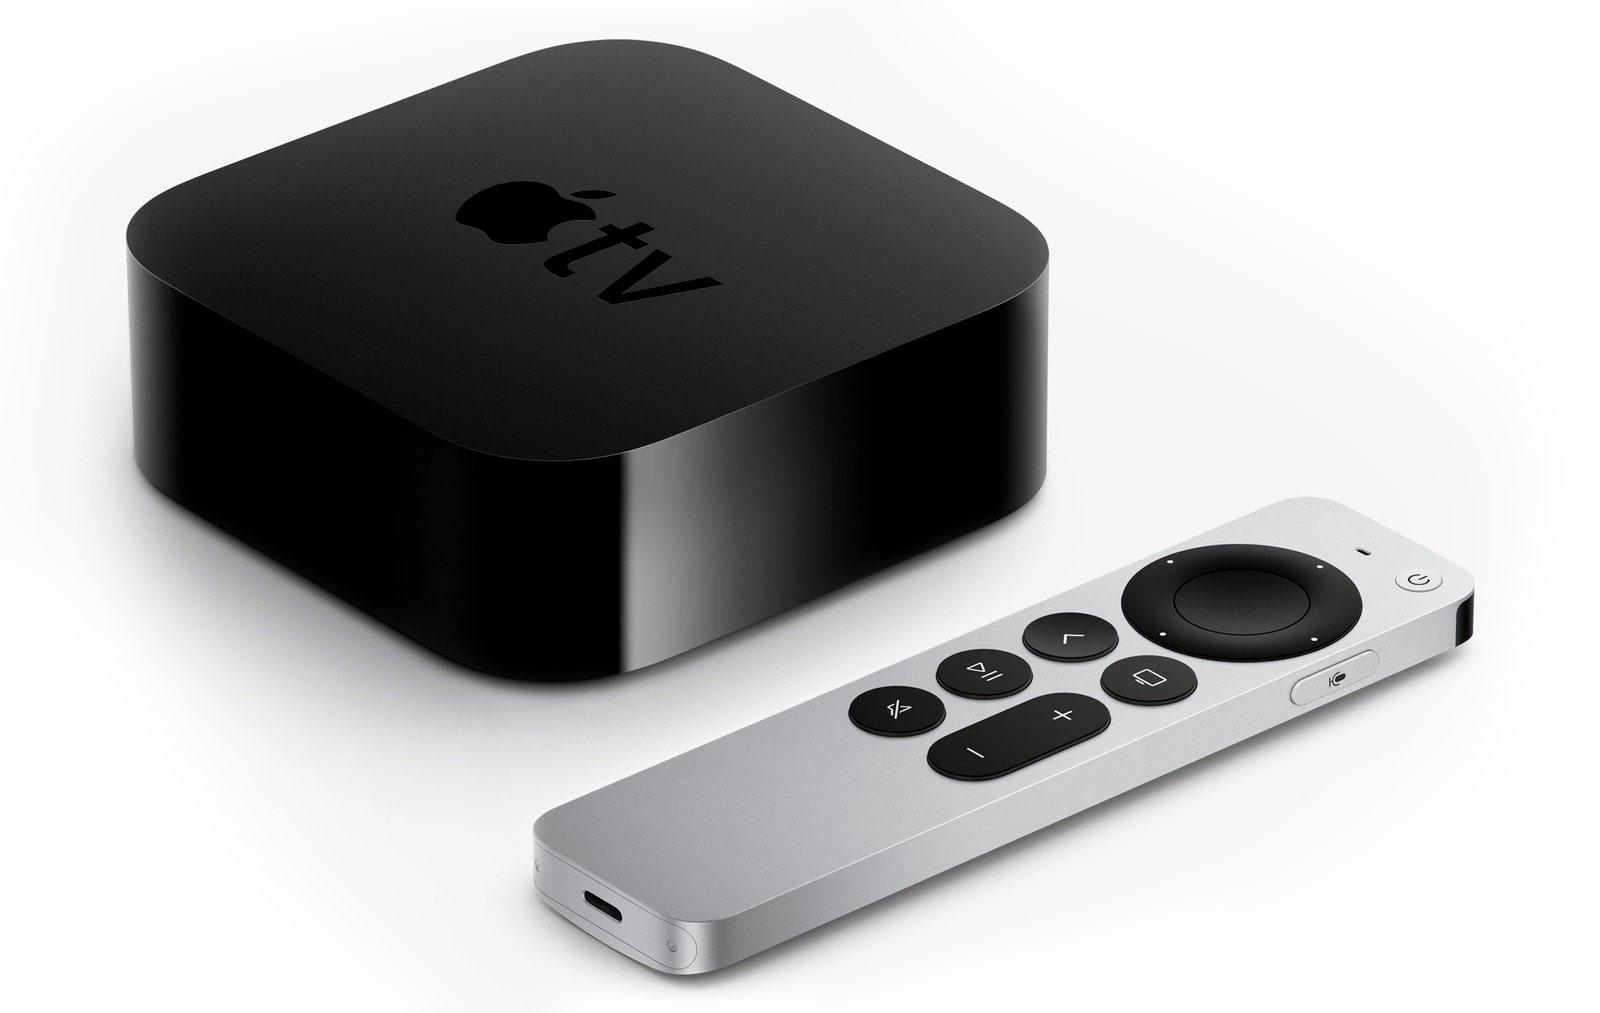 https://www.macfreak.nl/modules/news/images/zArt.AppleTV4KGen2MetRemote-2.jpg